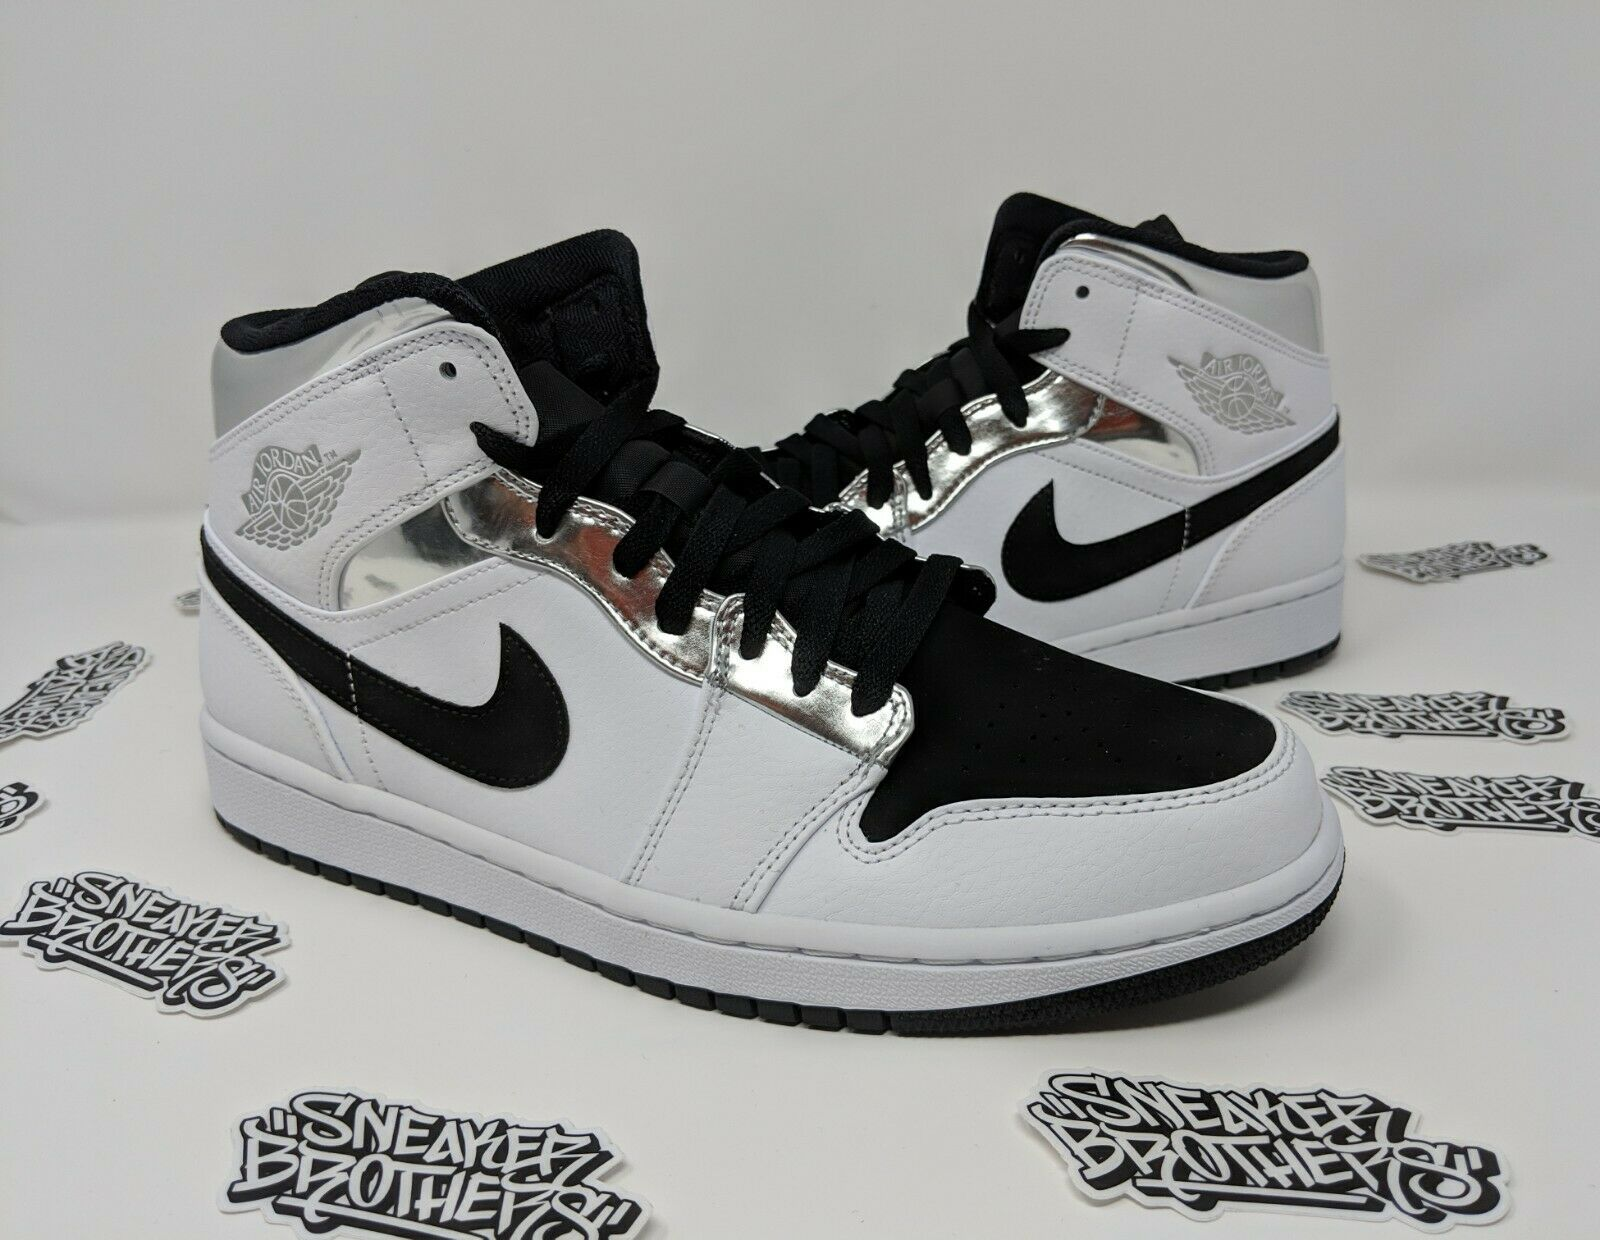 Nike Air Jordan Retro I 1 Mid Alternate Think White Silver Black 554724-121